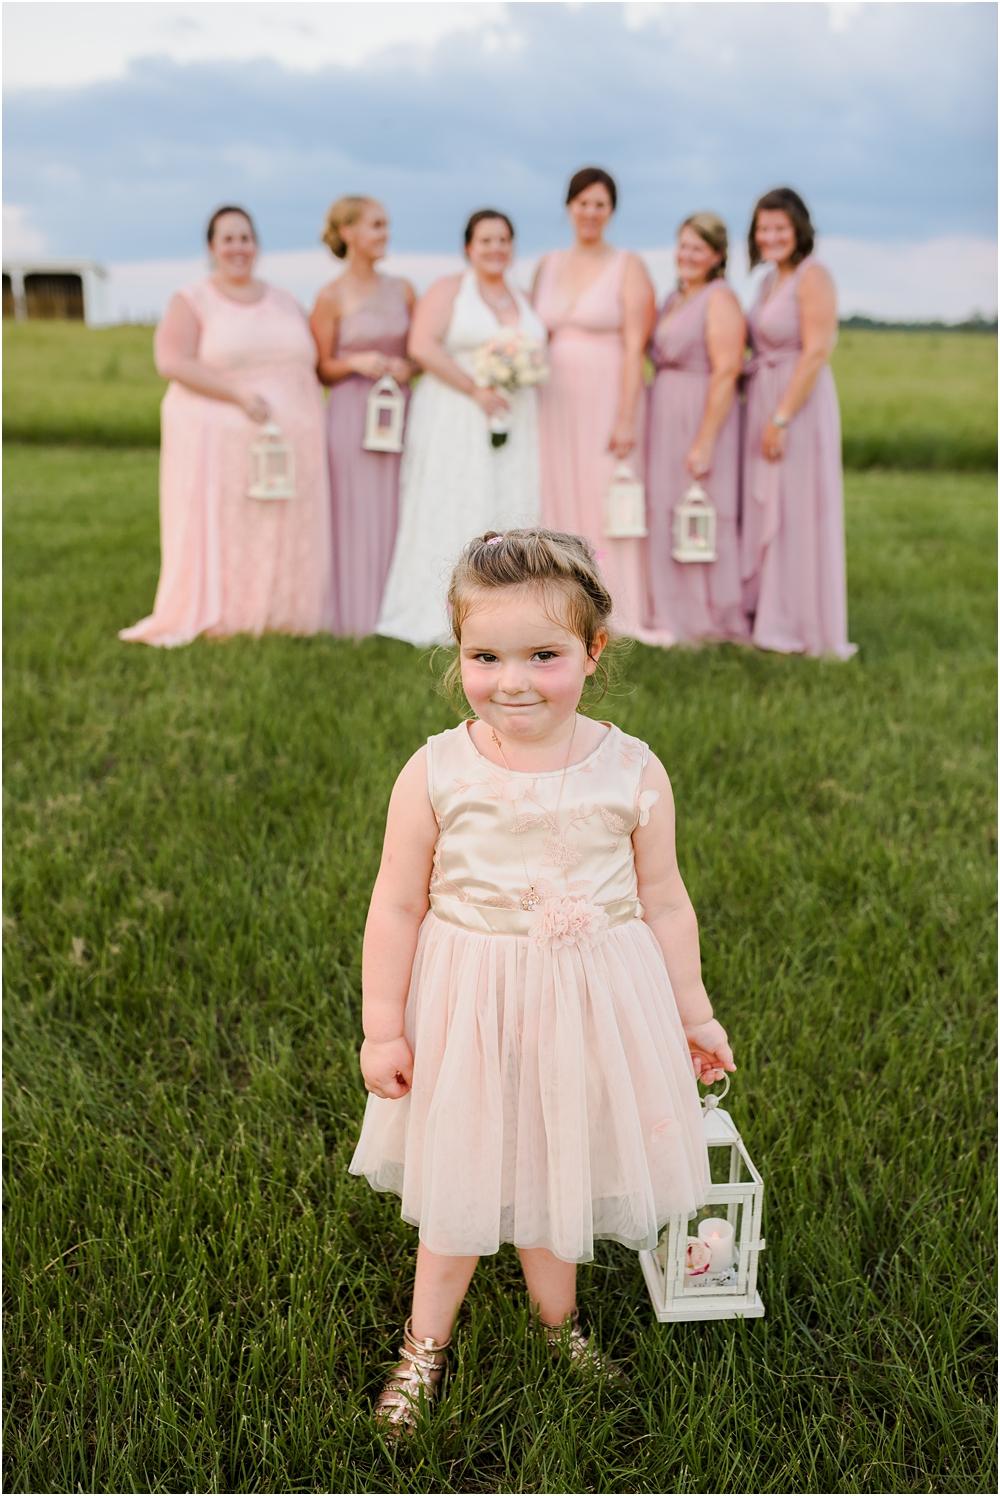 mosley-wedding-kiersten-stevenson-photography-30a-panama-city-beach-dothan-tallahassee-(288-of-472).JPG